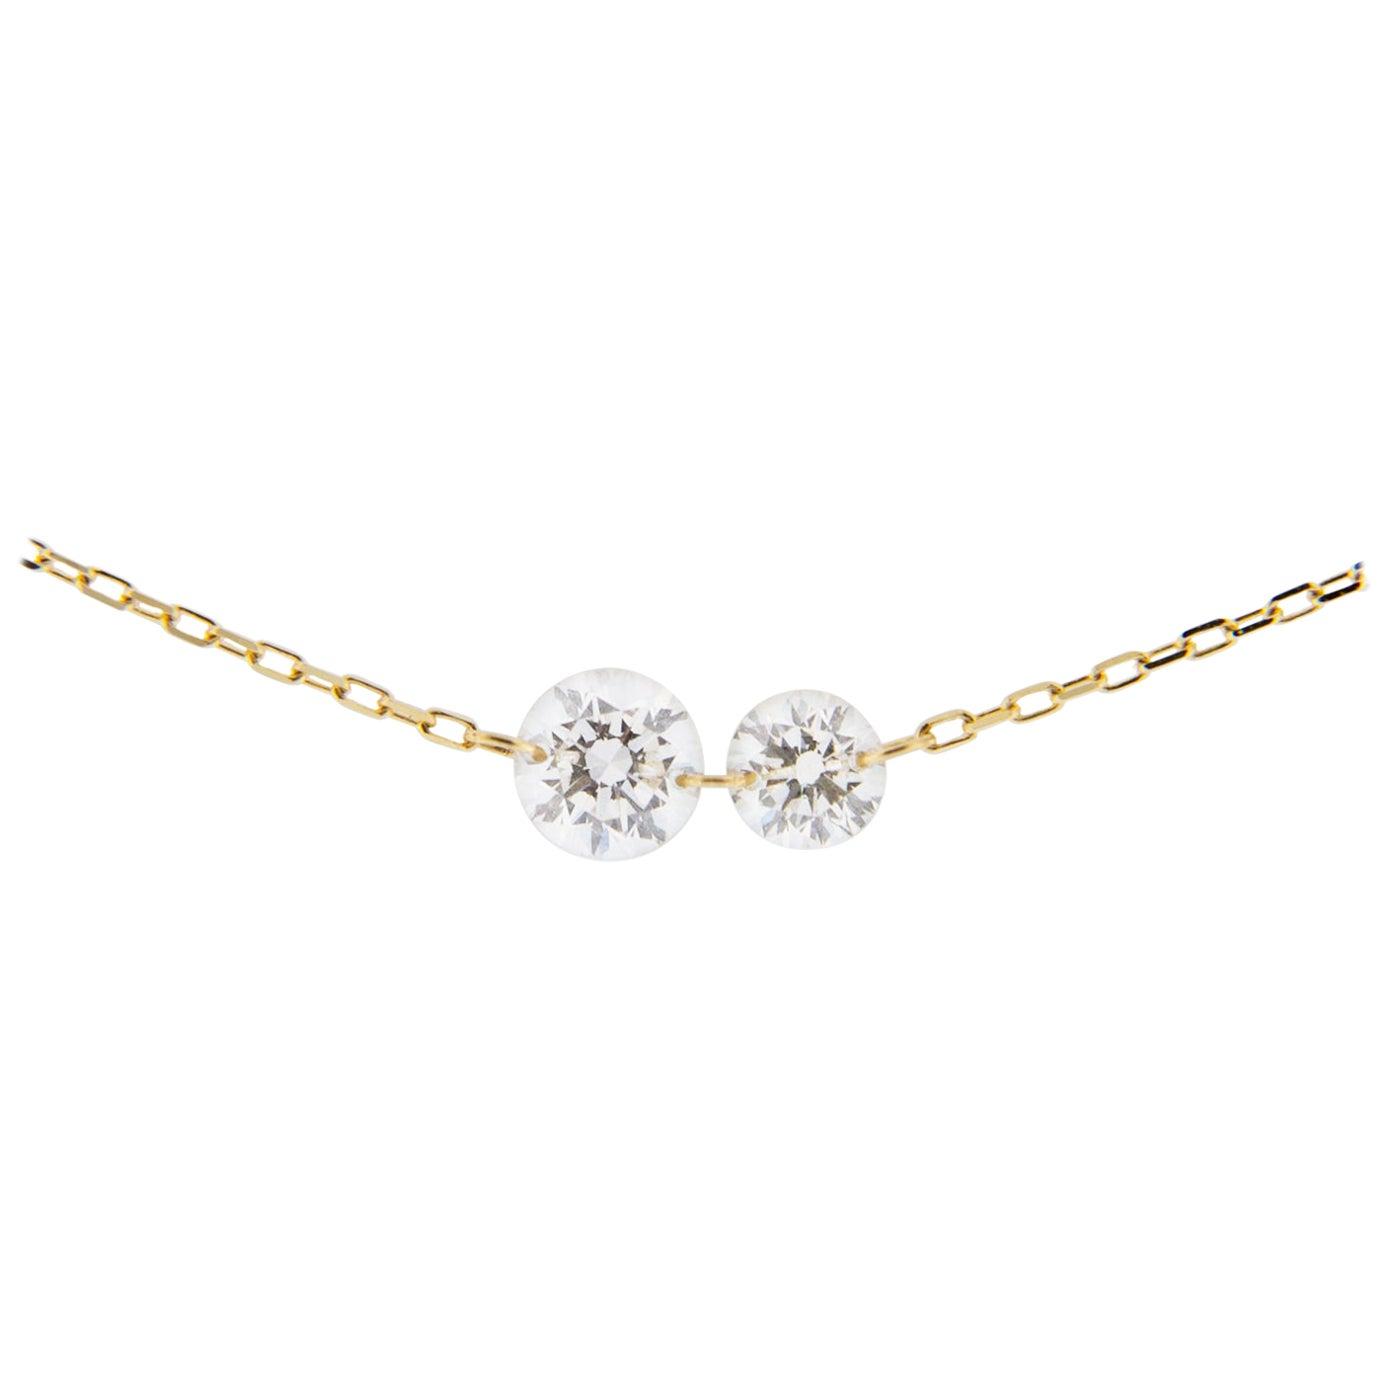 Jona Floating White Diamond 18 Karat Yellow Gold Necklace